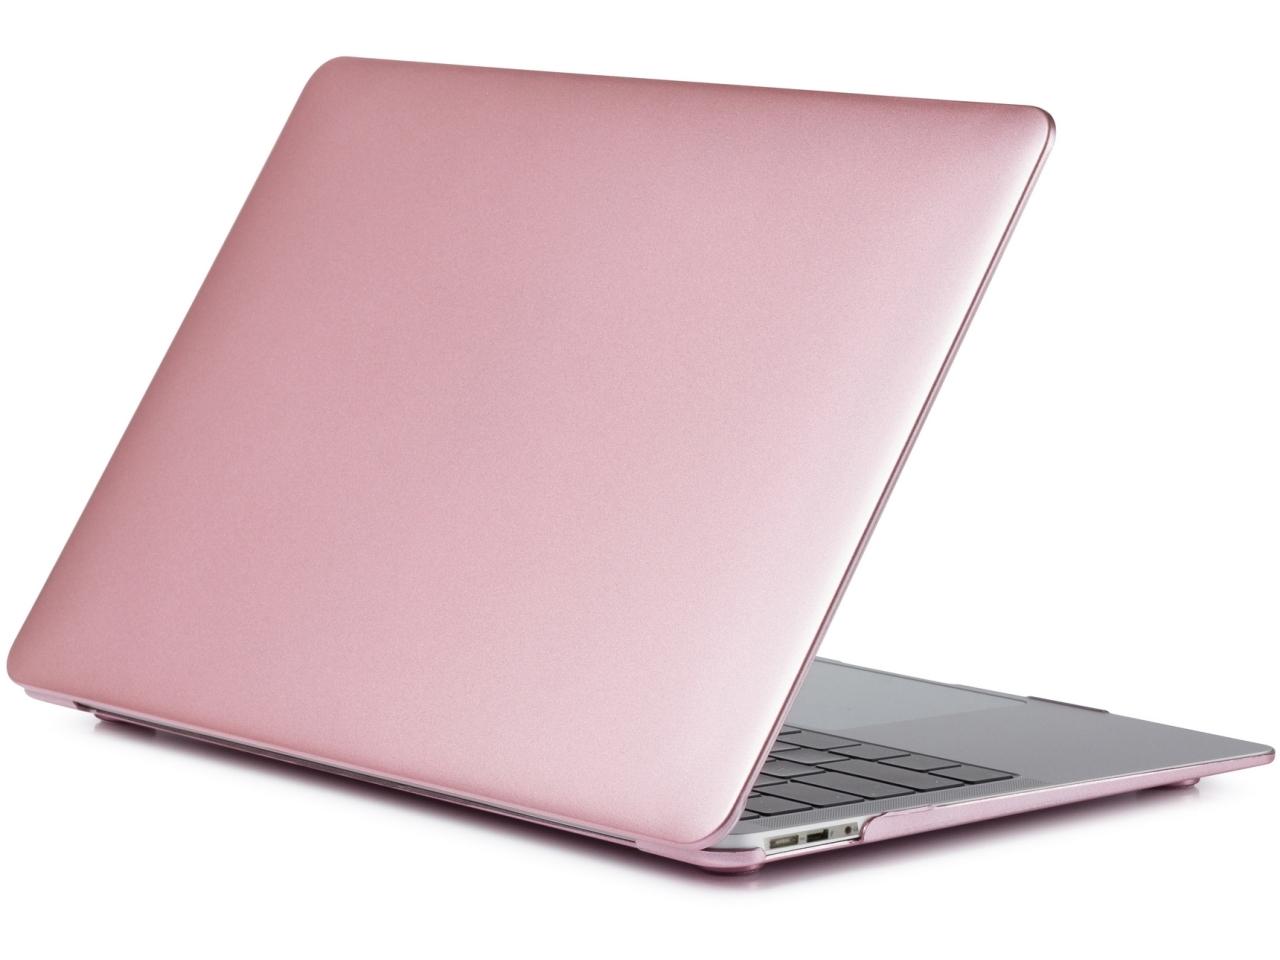 macbook air 13 schutzh lle metallic rosa matt case smartshell h lle macbook air 13 kein. Black Bedroom Furniture Sets. Home Design Ideas